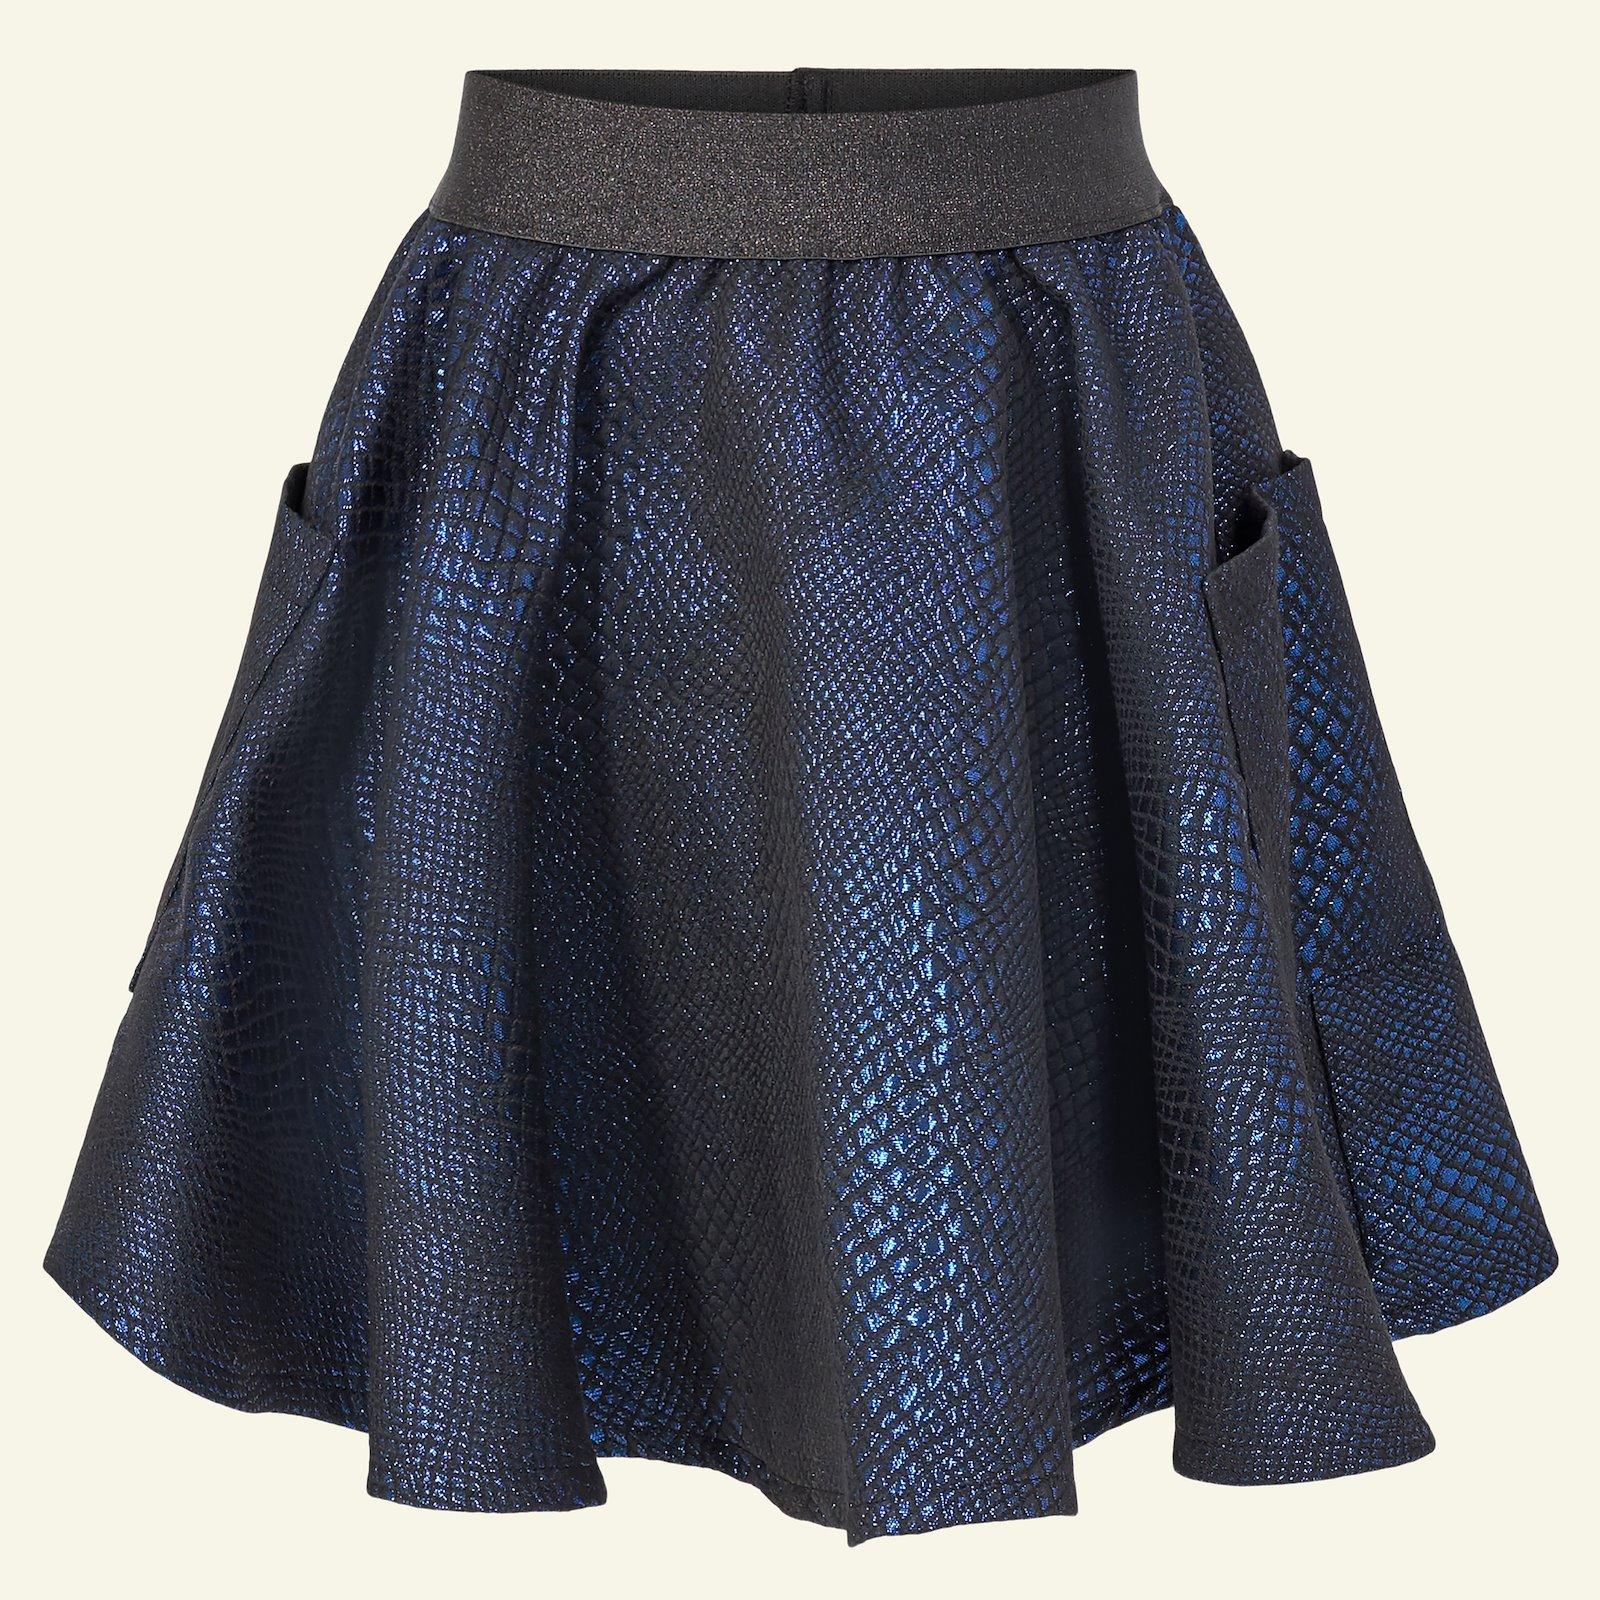 Tulle skirt, 140/10y p61018_400307_sskit